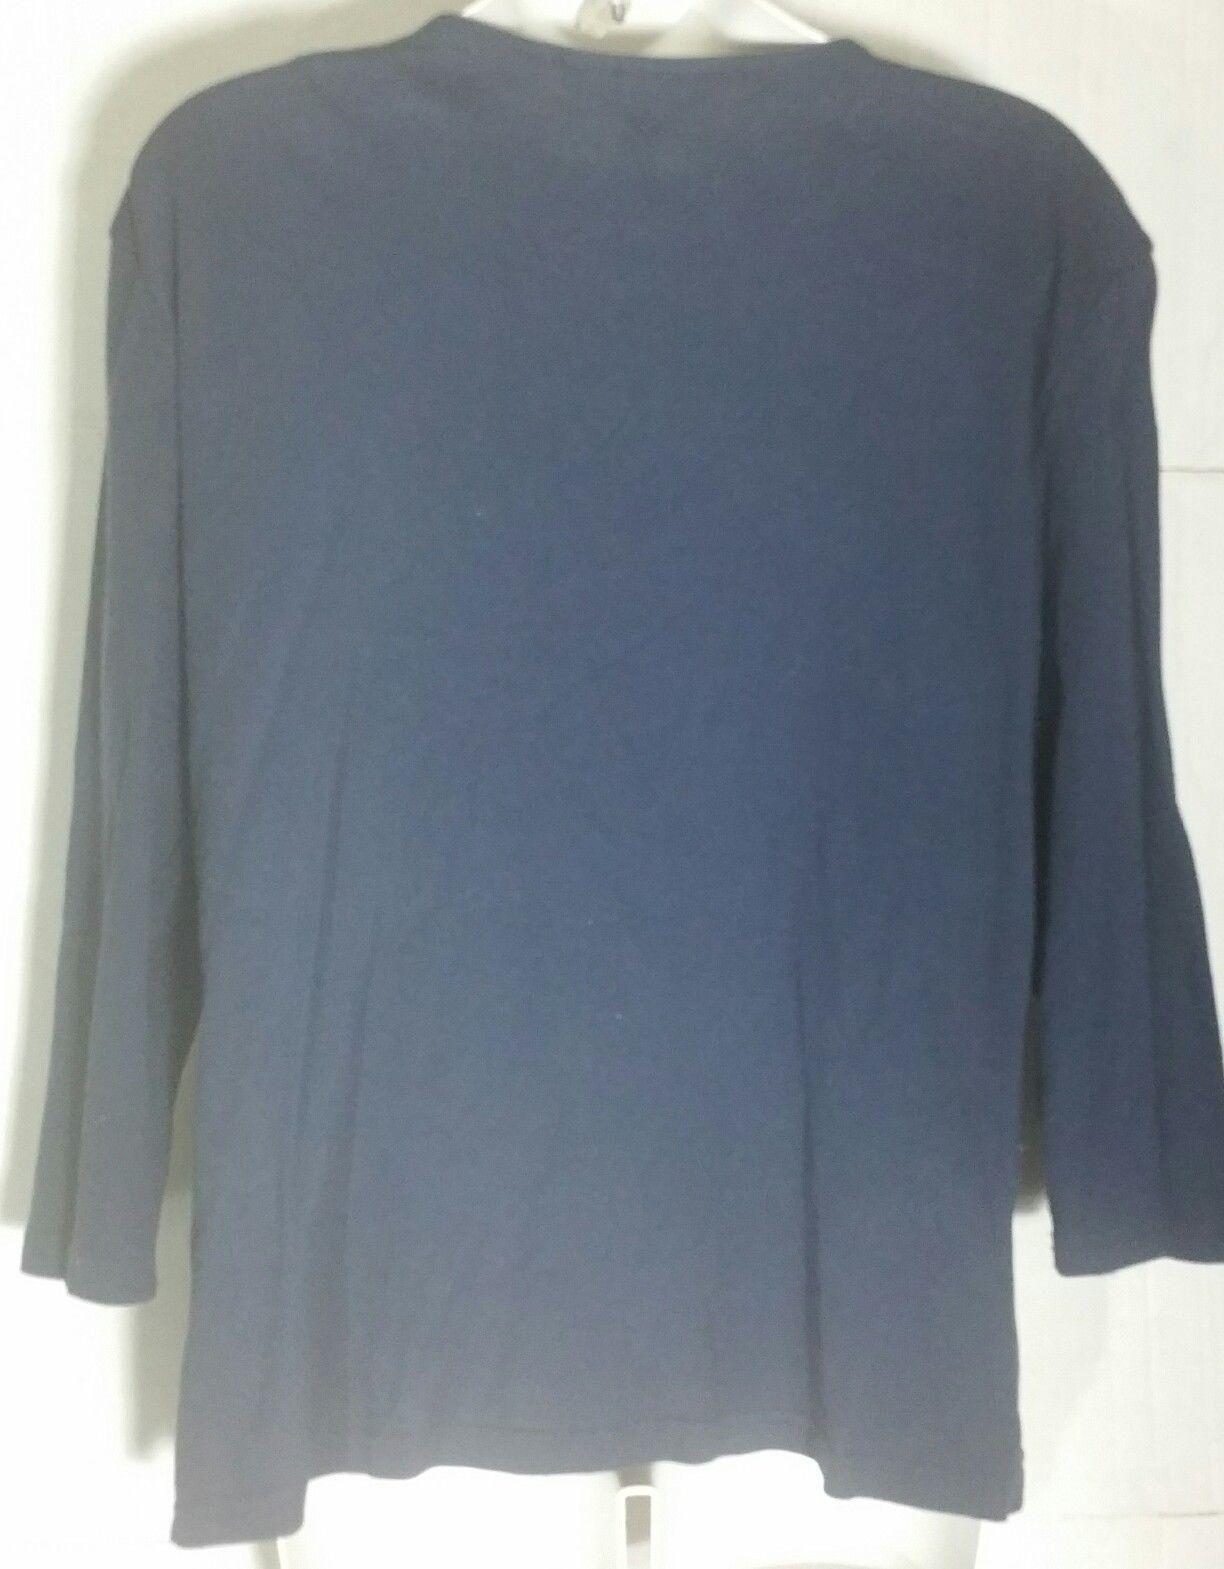 Karen Scott Top Large L Tunic Print Boho Silver Embellished Shirt Blue